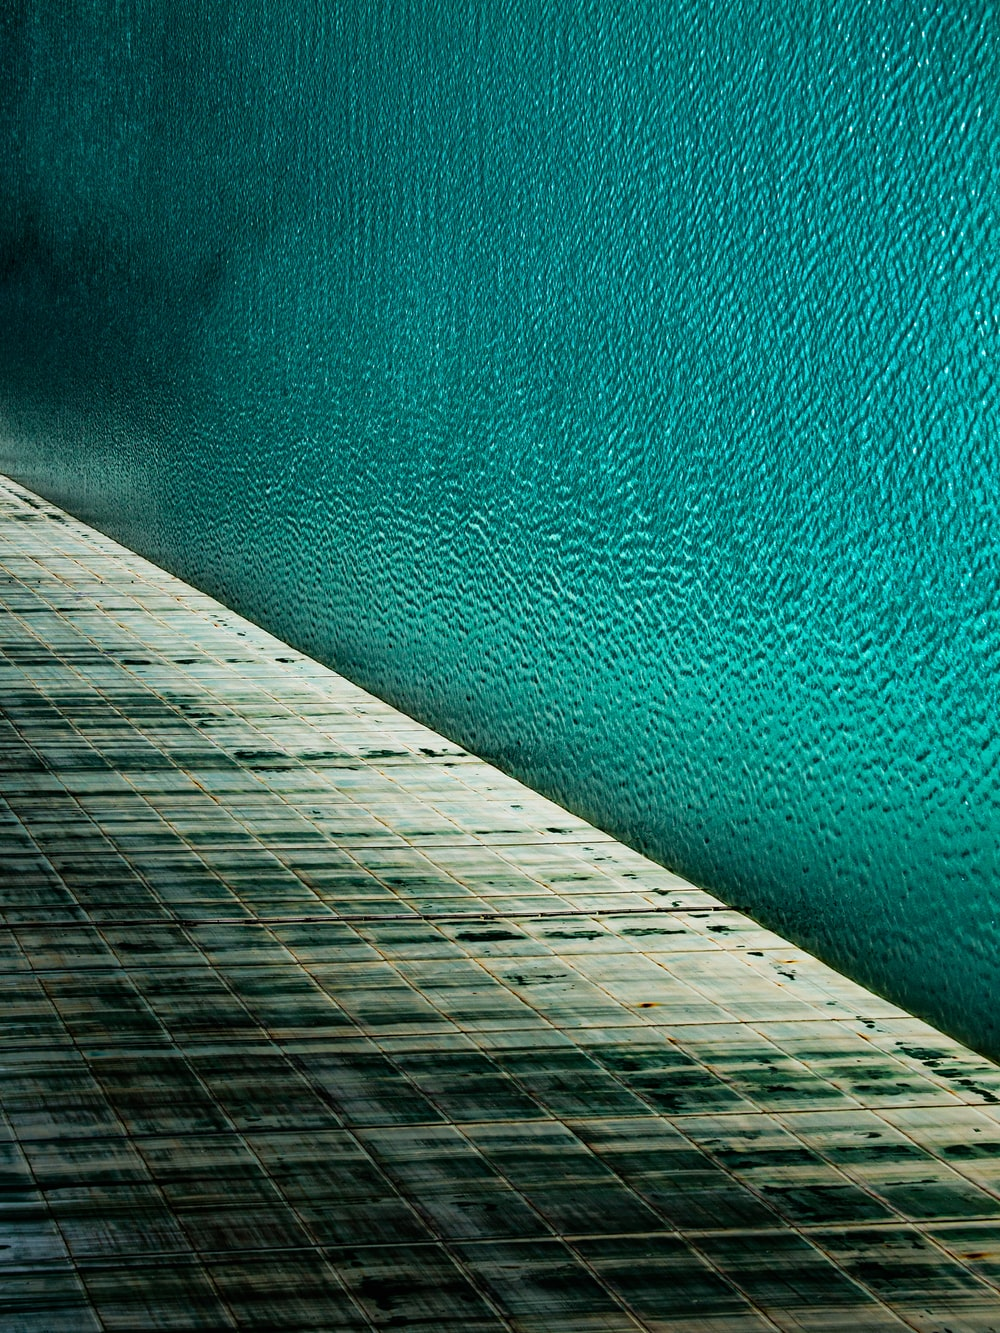 brown wooden dock over blue water